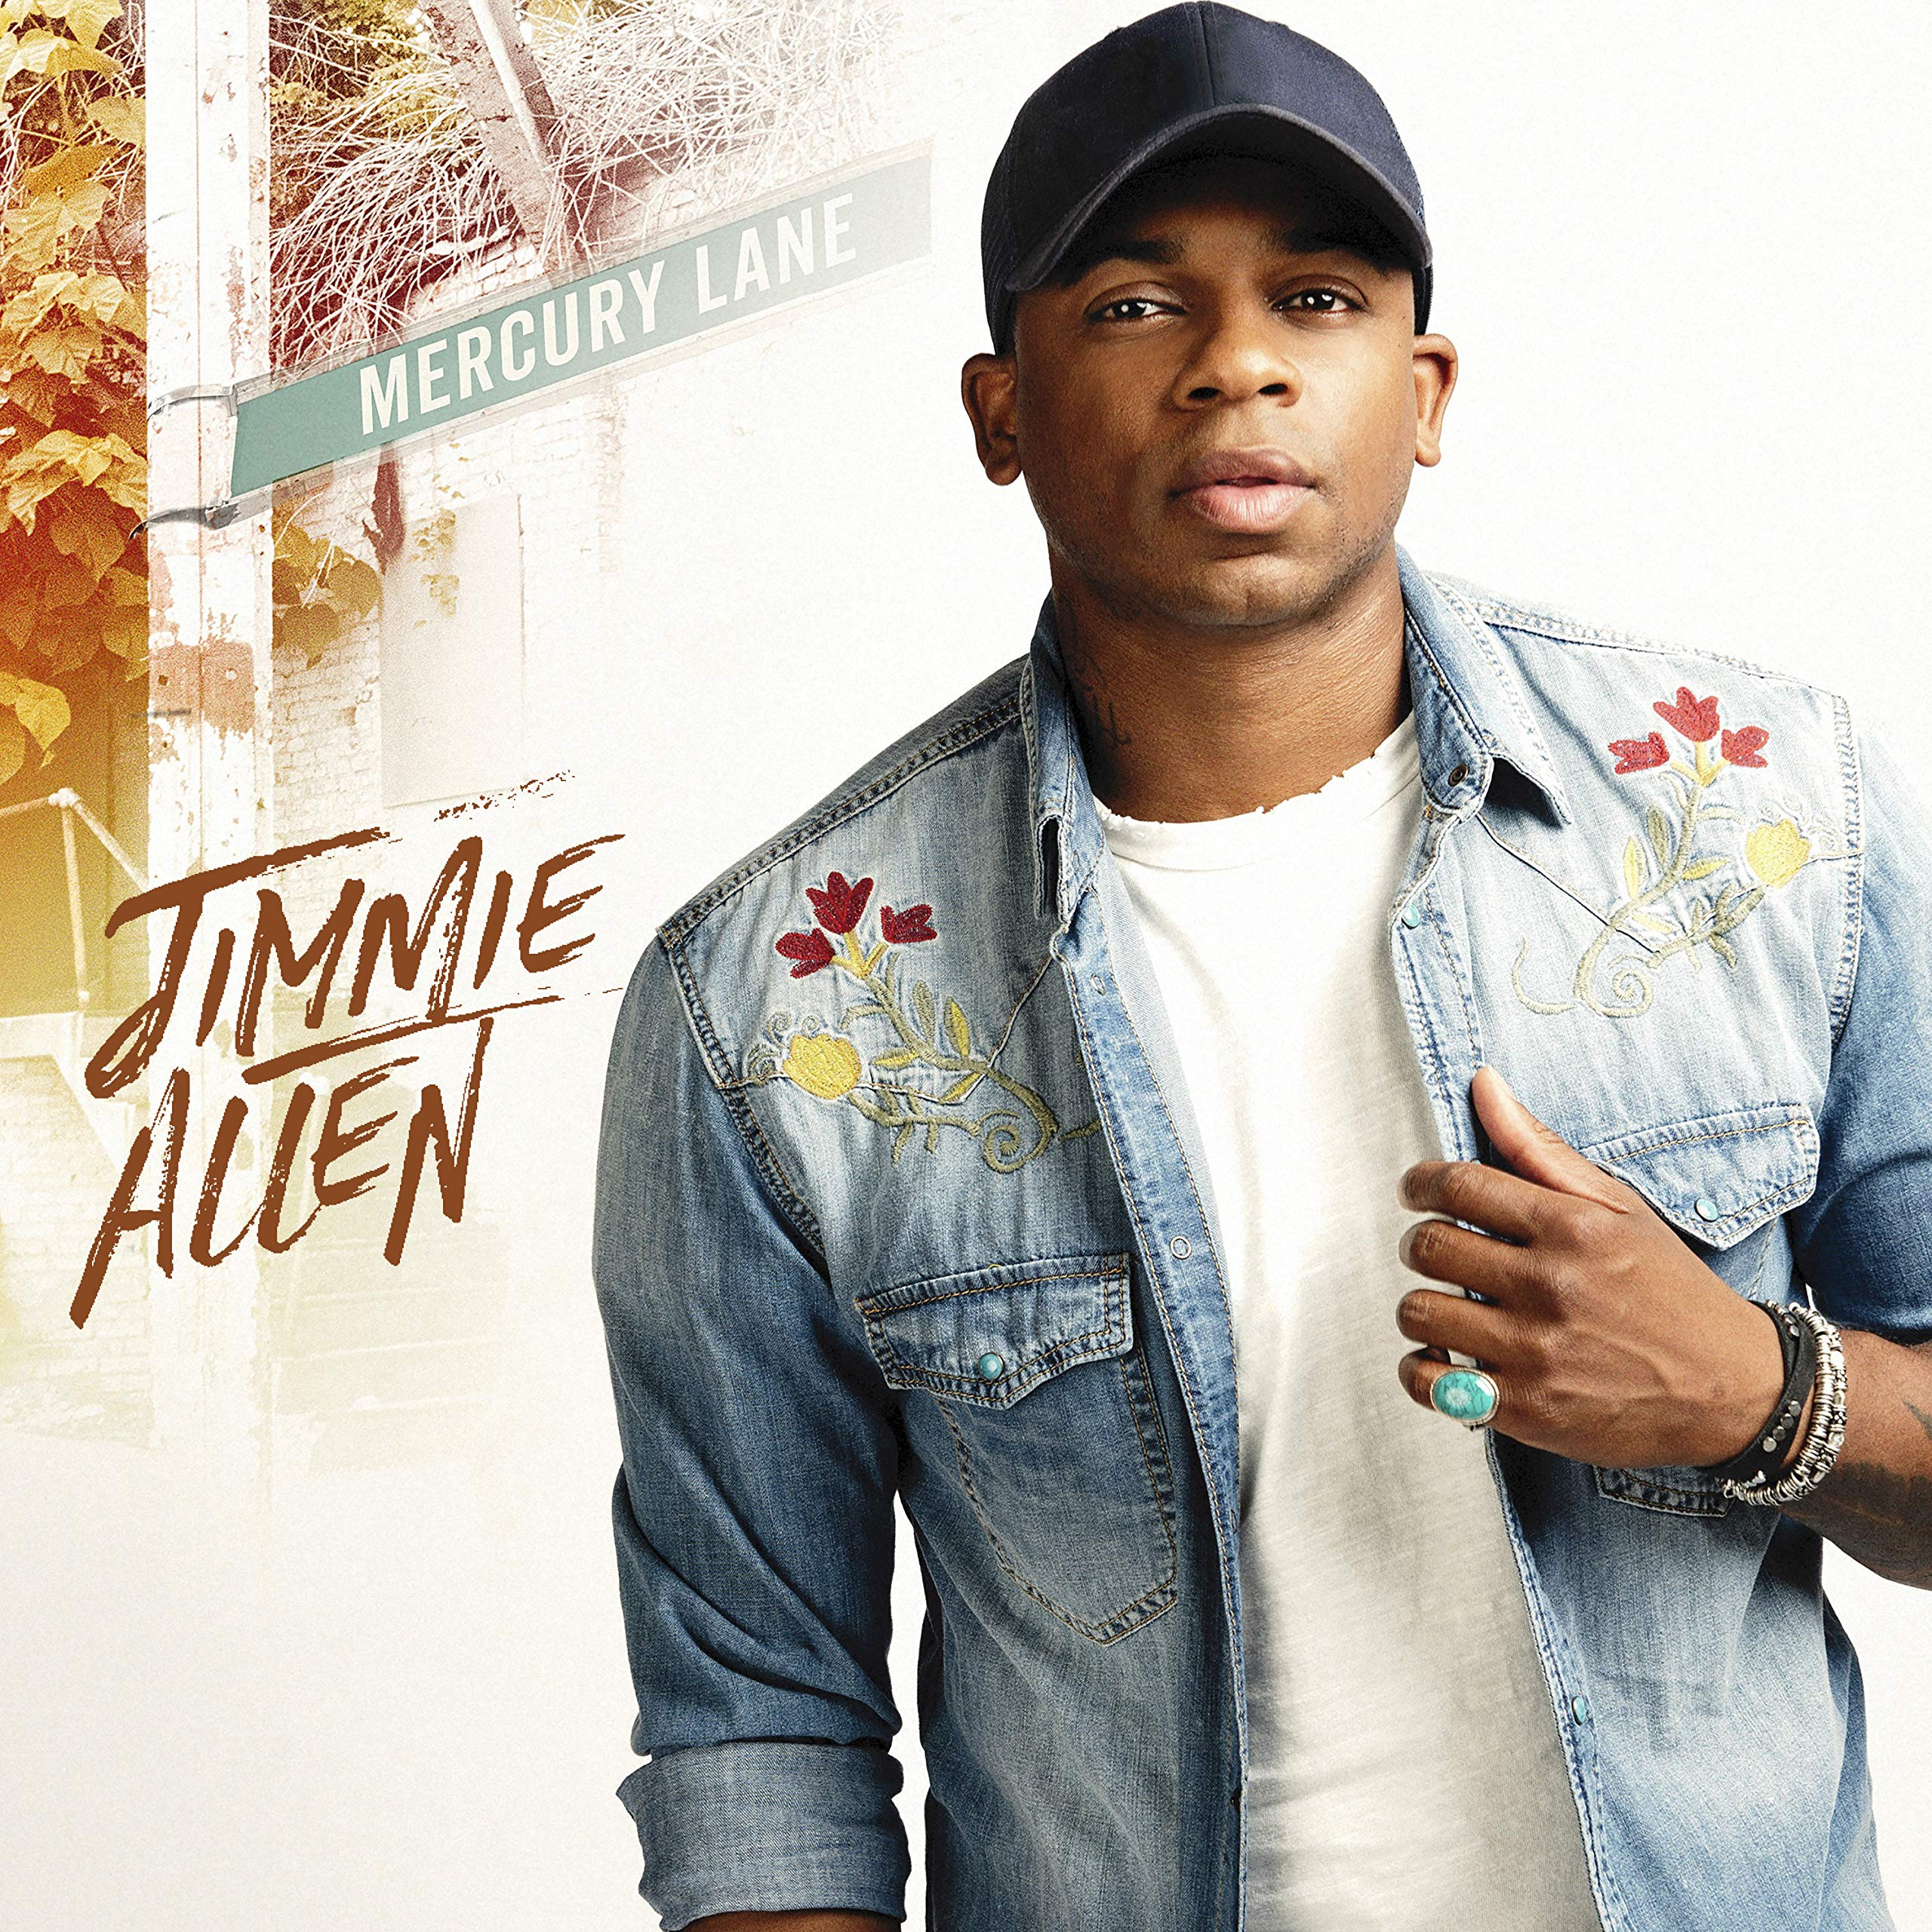 CD : Jimmie Allen - Mercury Lane (CD)